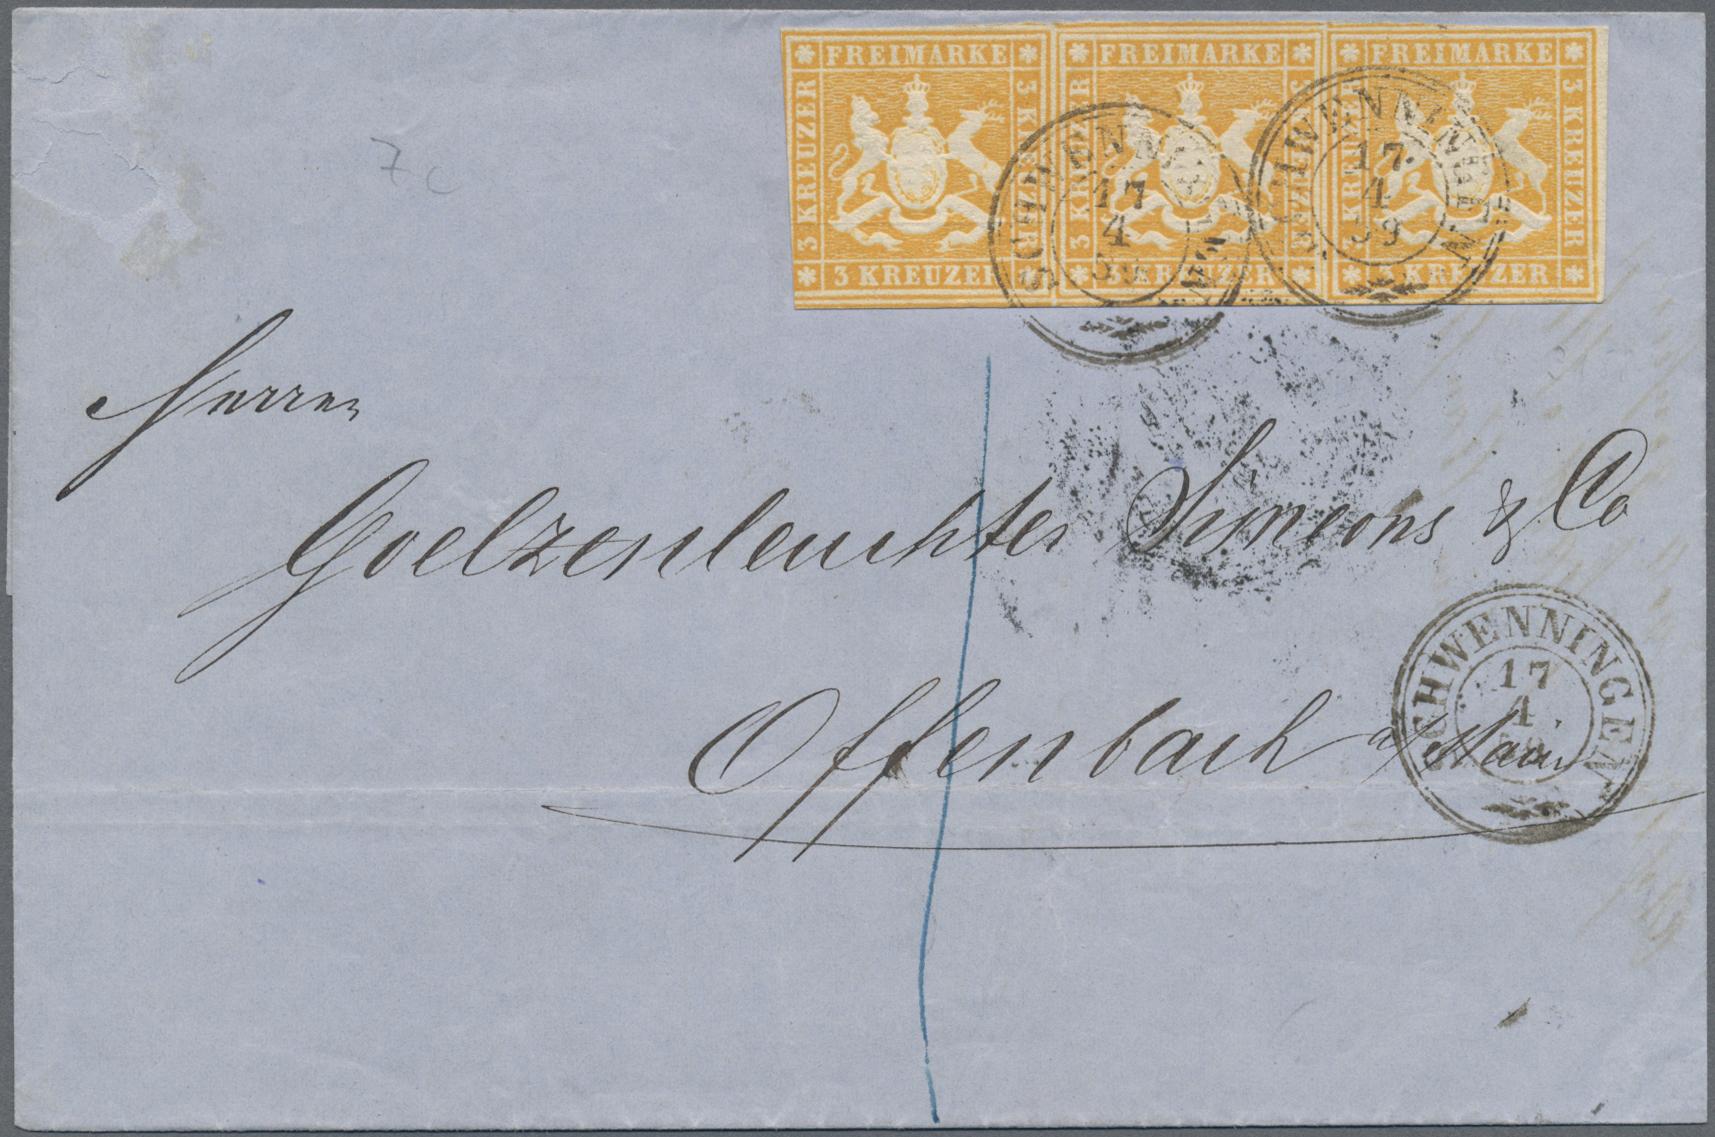 Lot 35181 - Württemberg - Marken und Briefe  -  Auktionshaus Christoph Gärtner GmbH & Co. KG Sale #44 Collections Germany